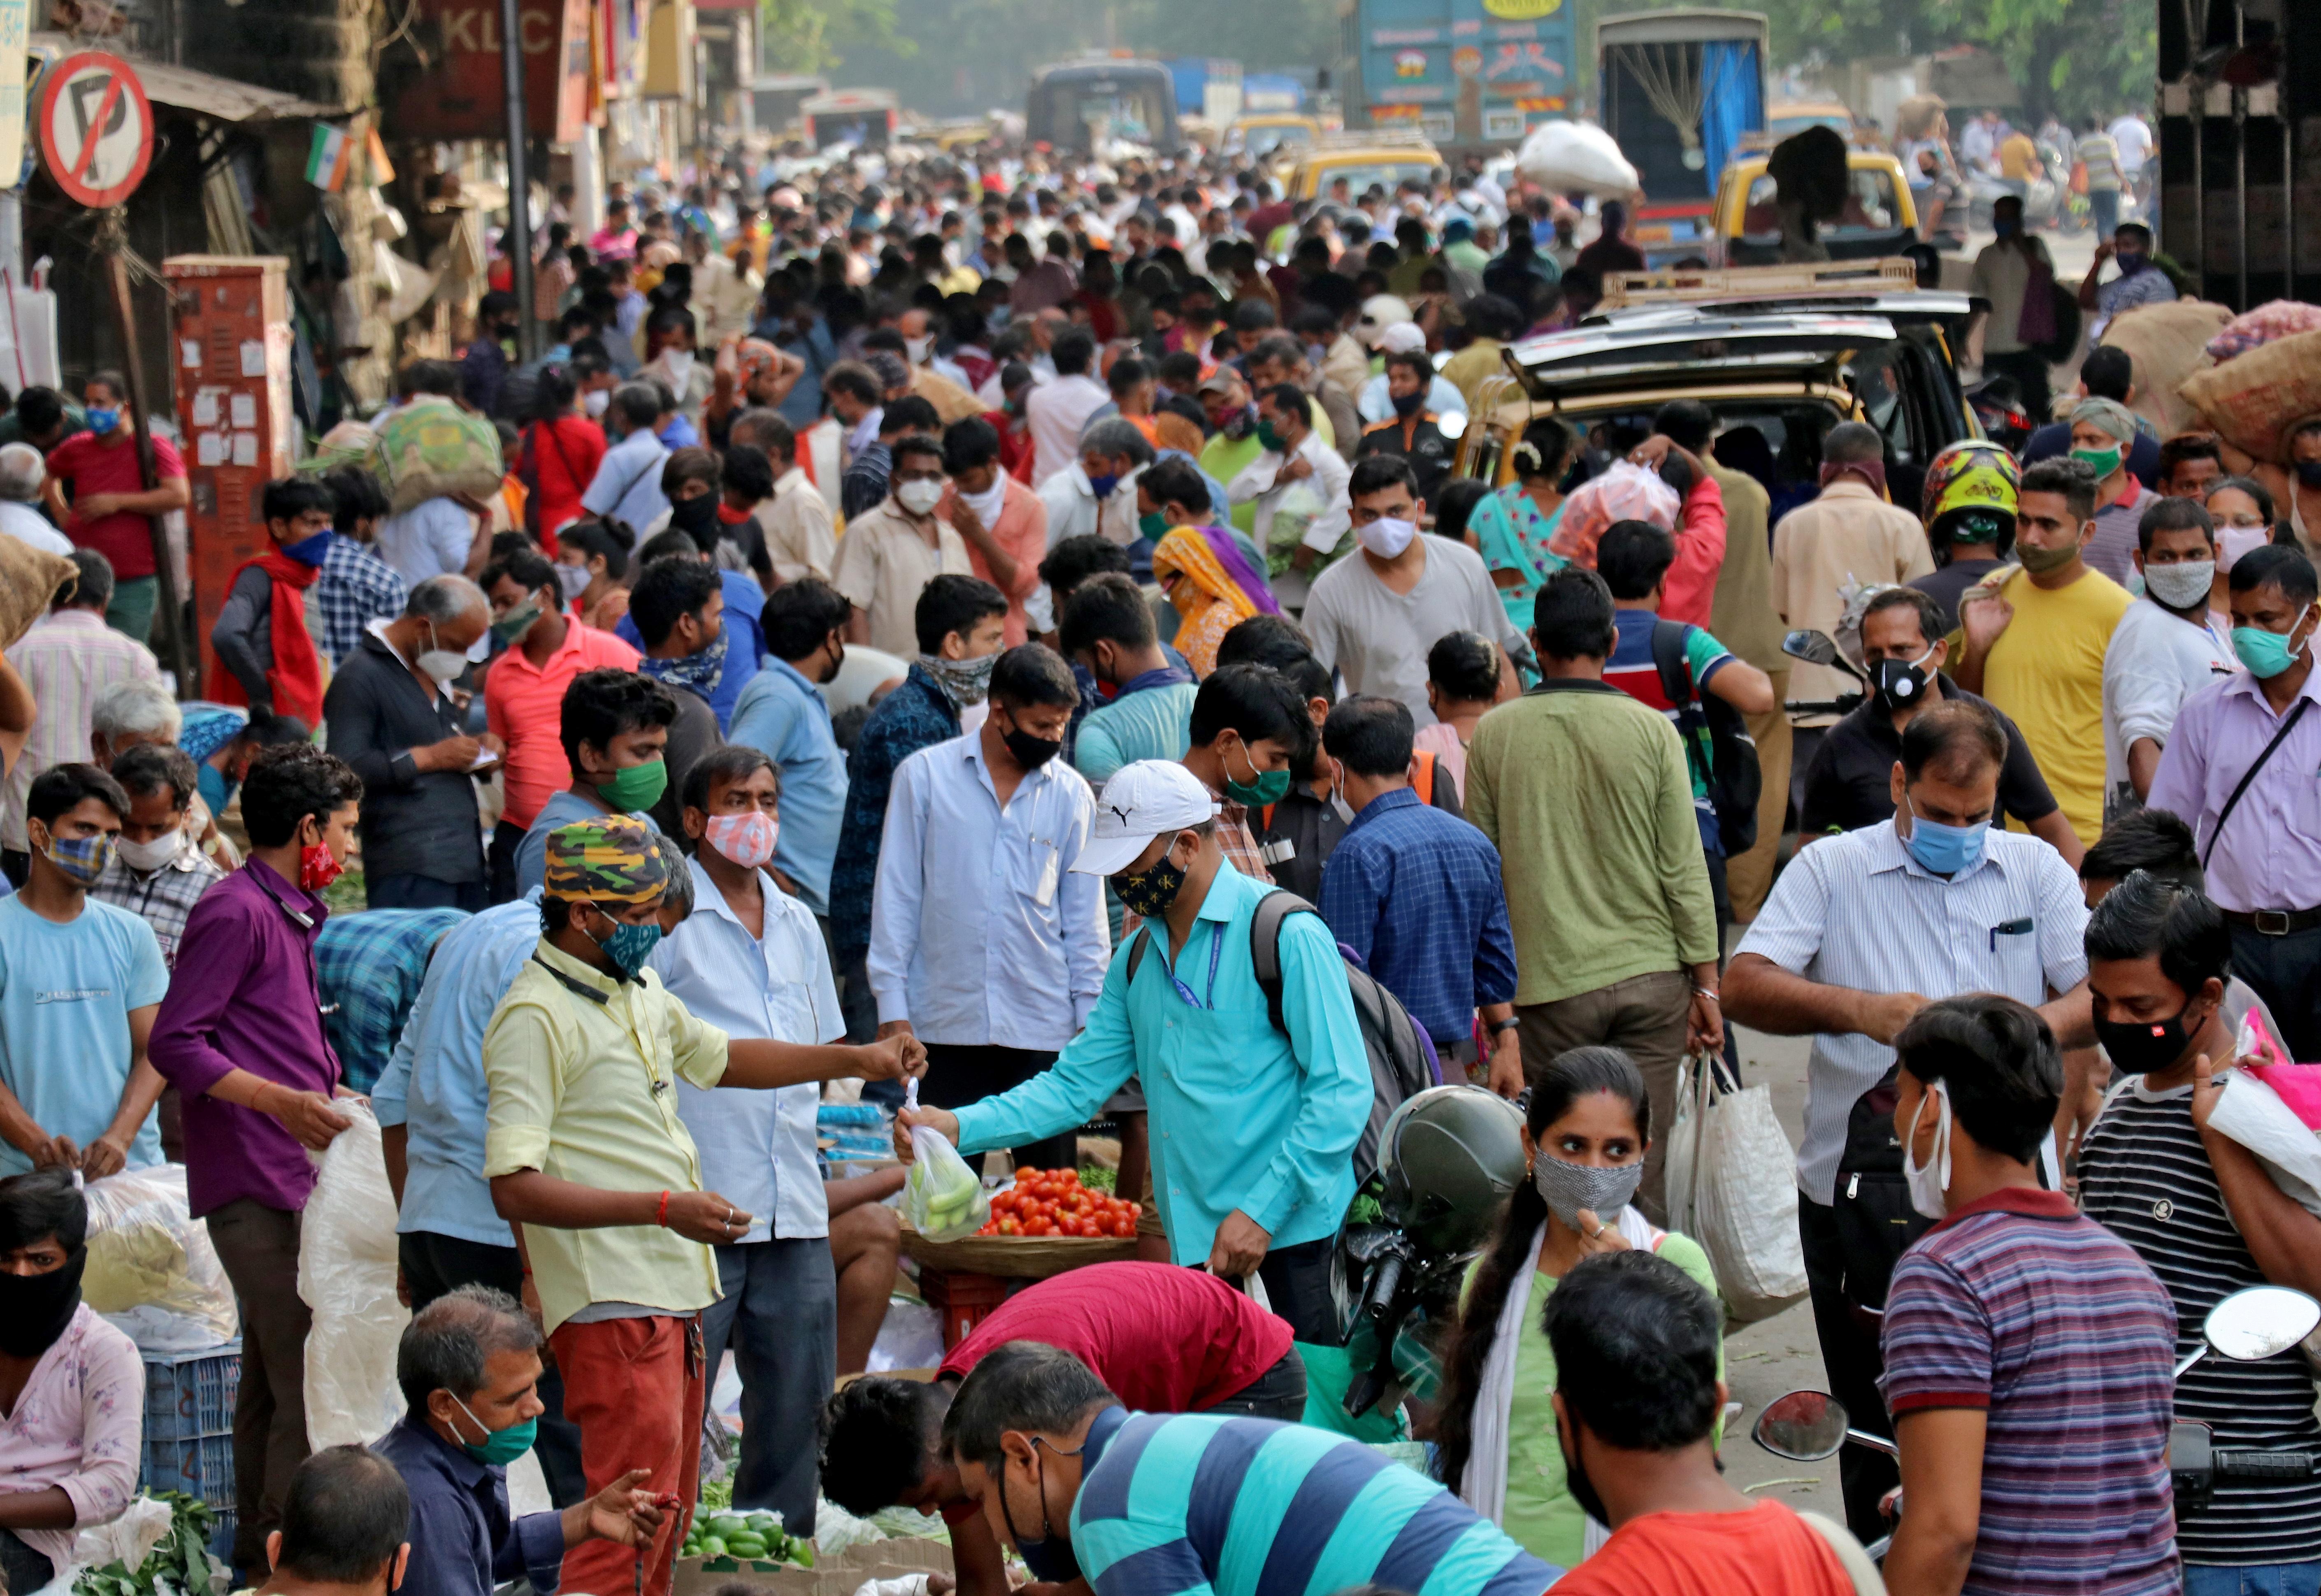 People shop at a crowded marketplace amidst the spread of the coronavirus disease (COVID-19) in Mumbai, India, April 21, 2021. REUTERS/Niharika Kulkarni